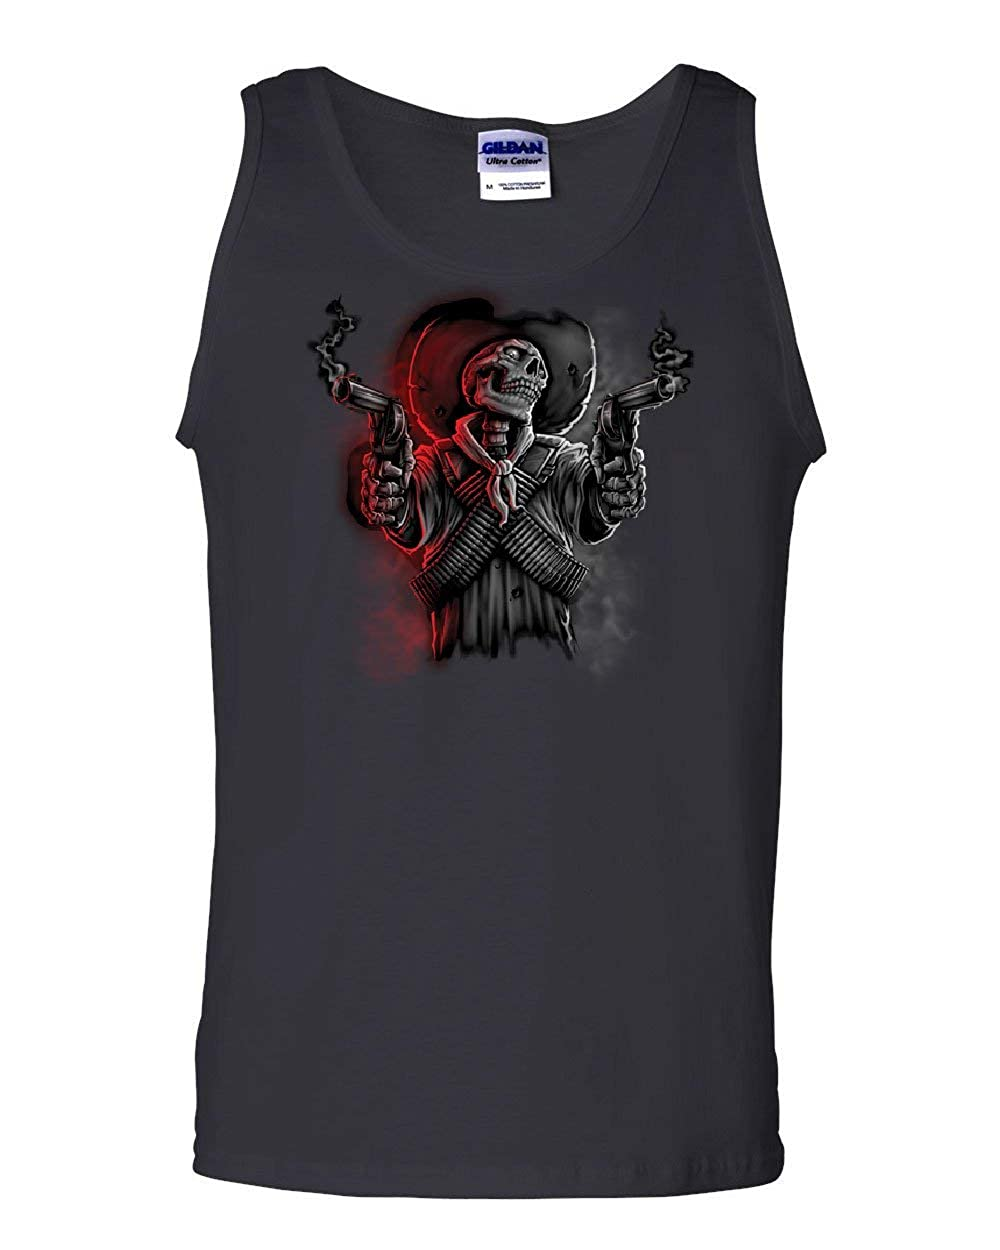 Tee Hunt Skeleton Bandit Tank Top Death Sheriff Wild West Revolvers Cowboy Sleeveless